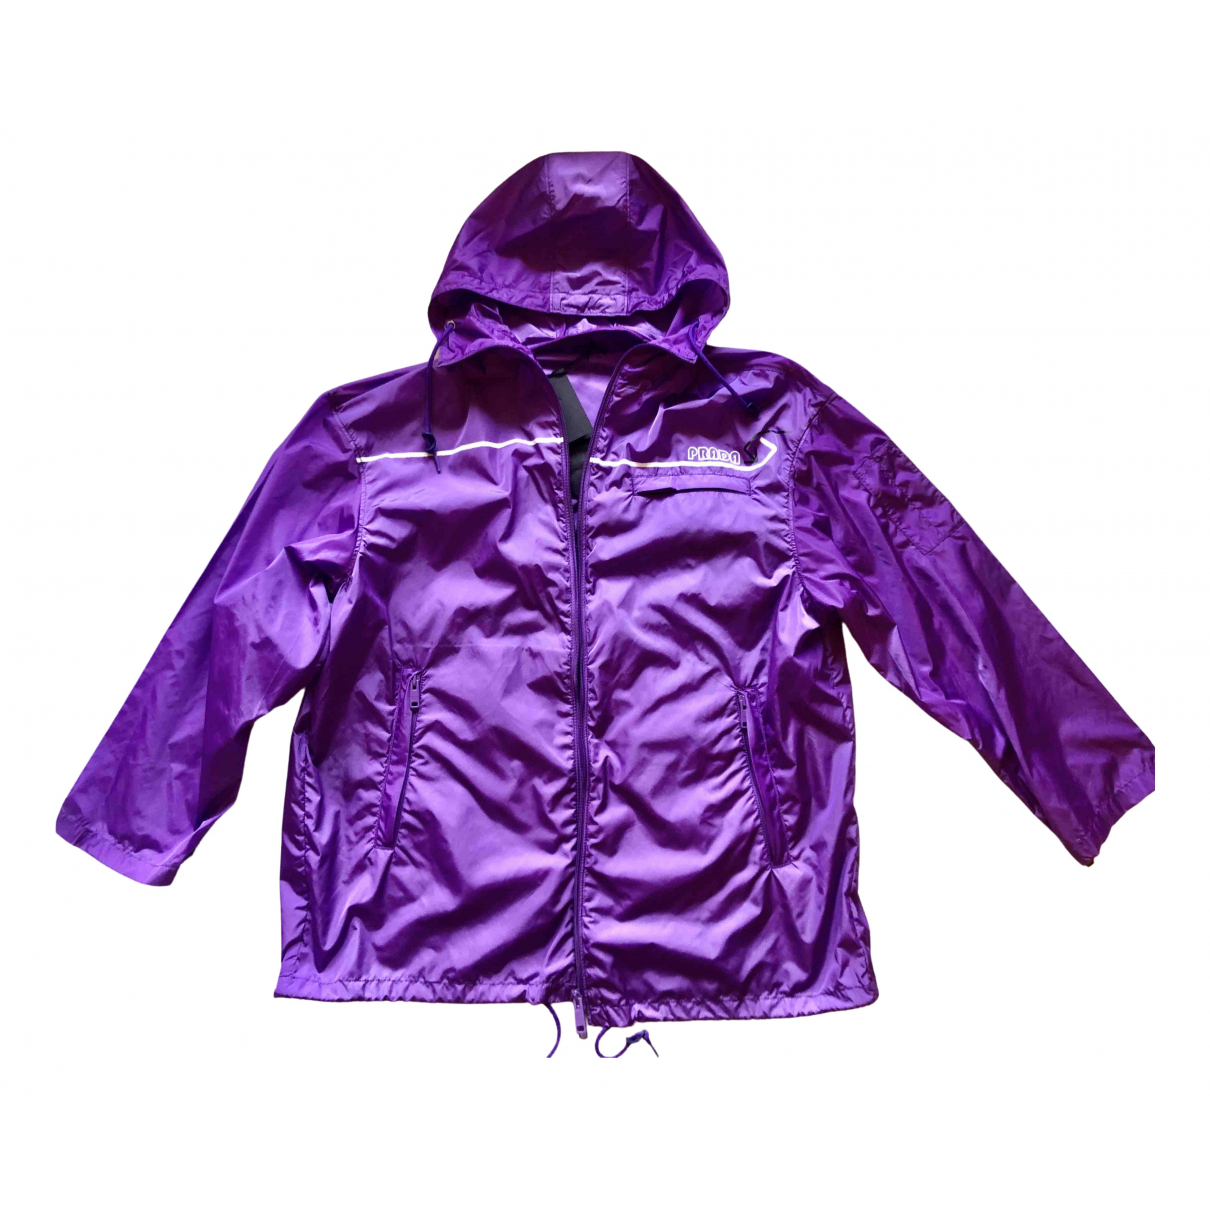 Prada \N Purple jacket for Women M International